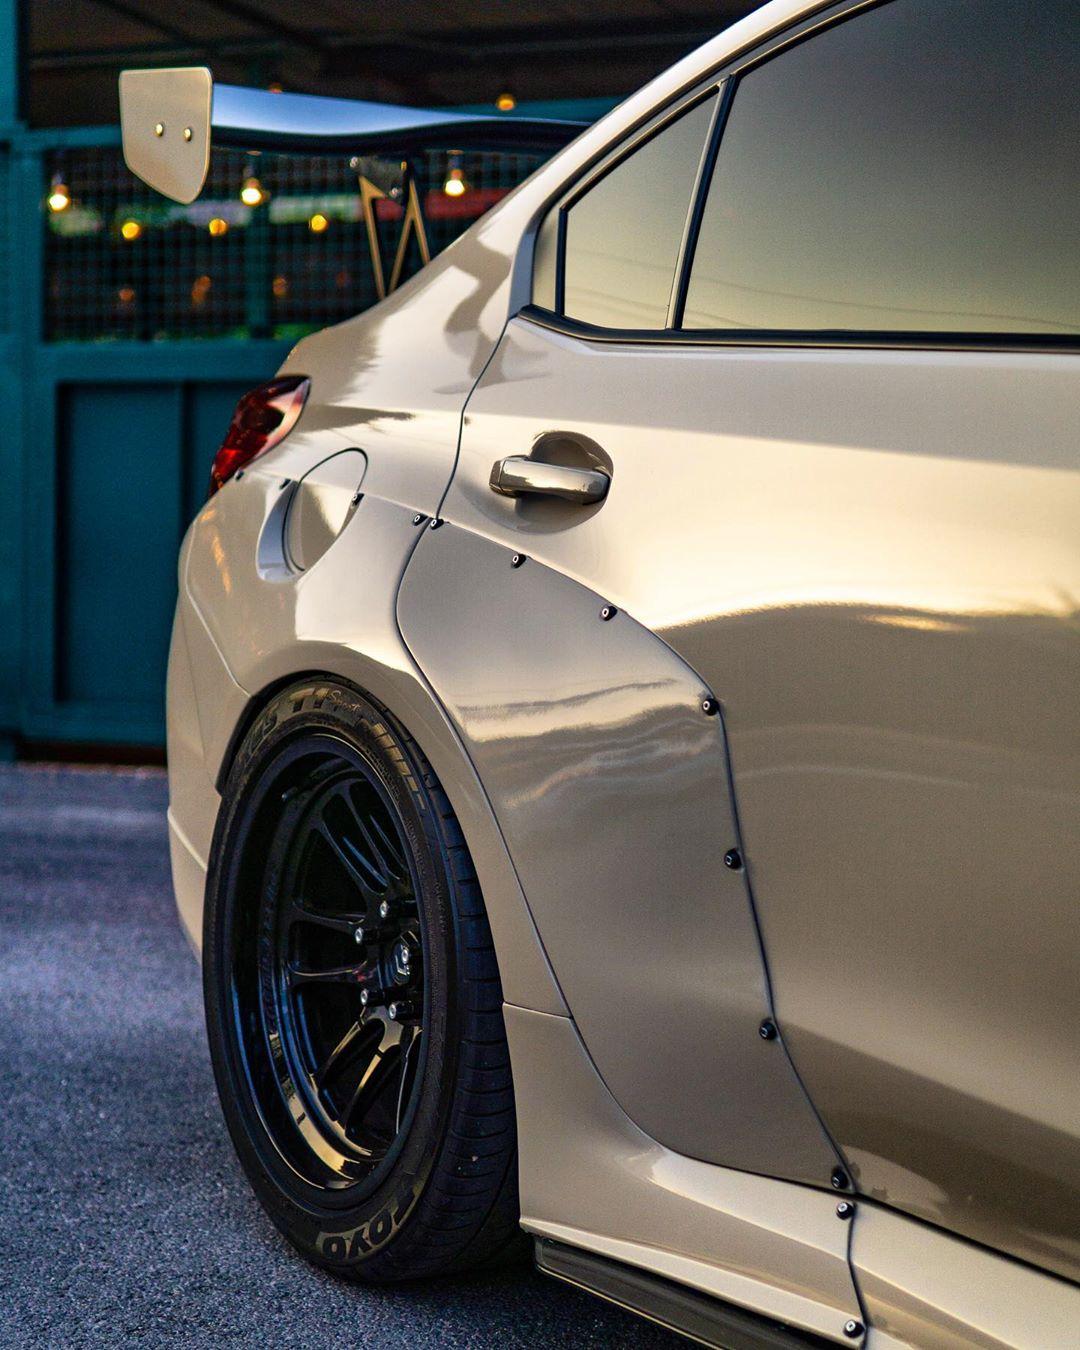 Subaru WRX STI With CCC Widebody Kit Shows Awesome Desert